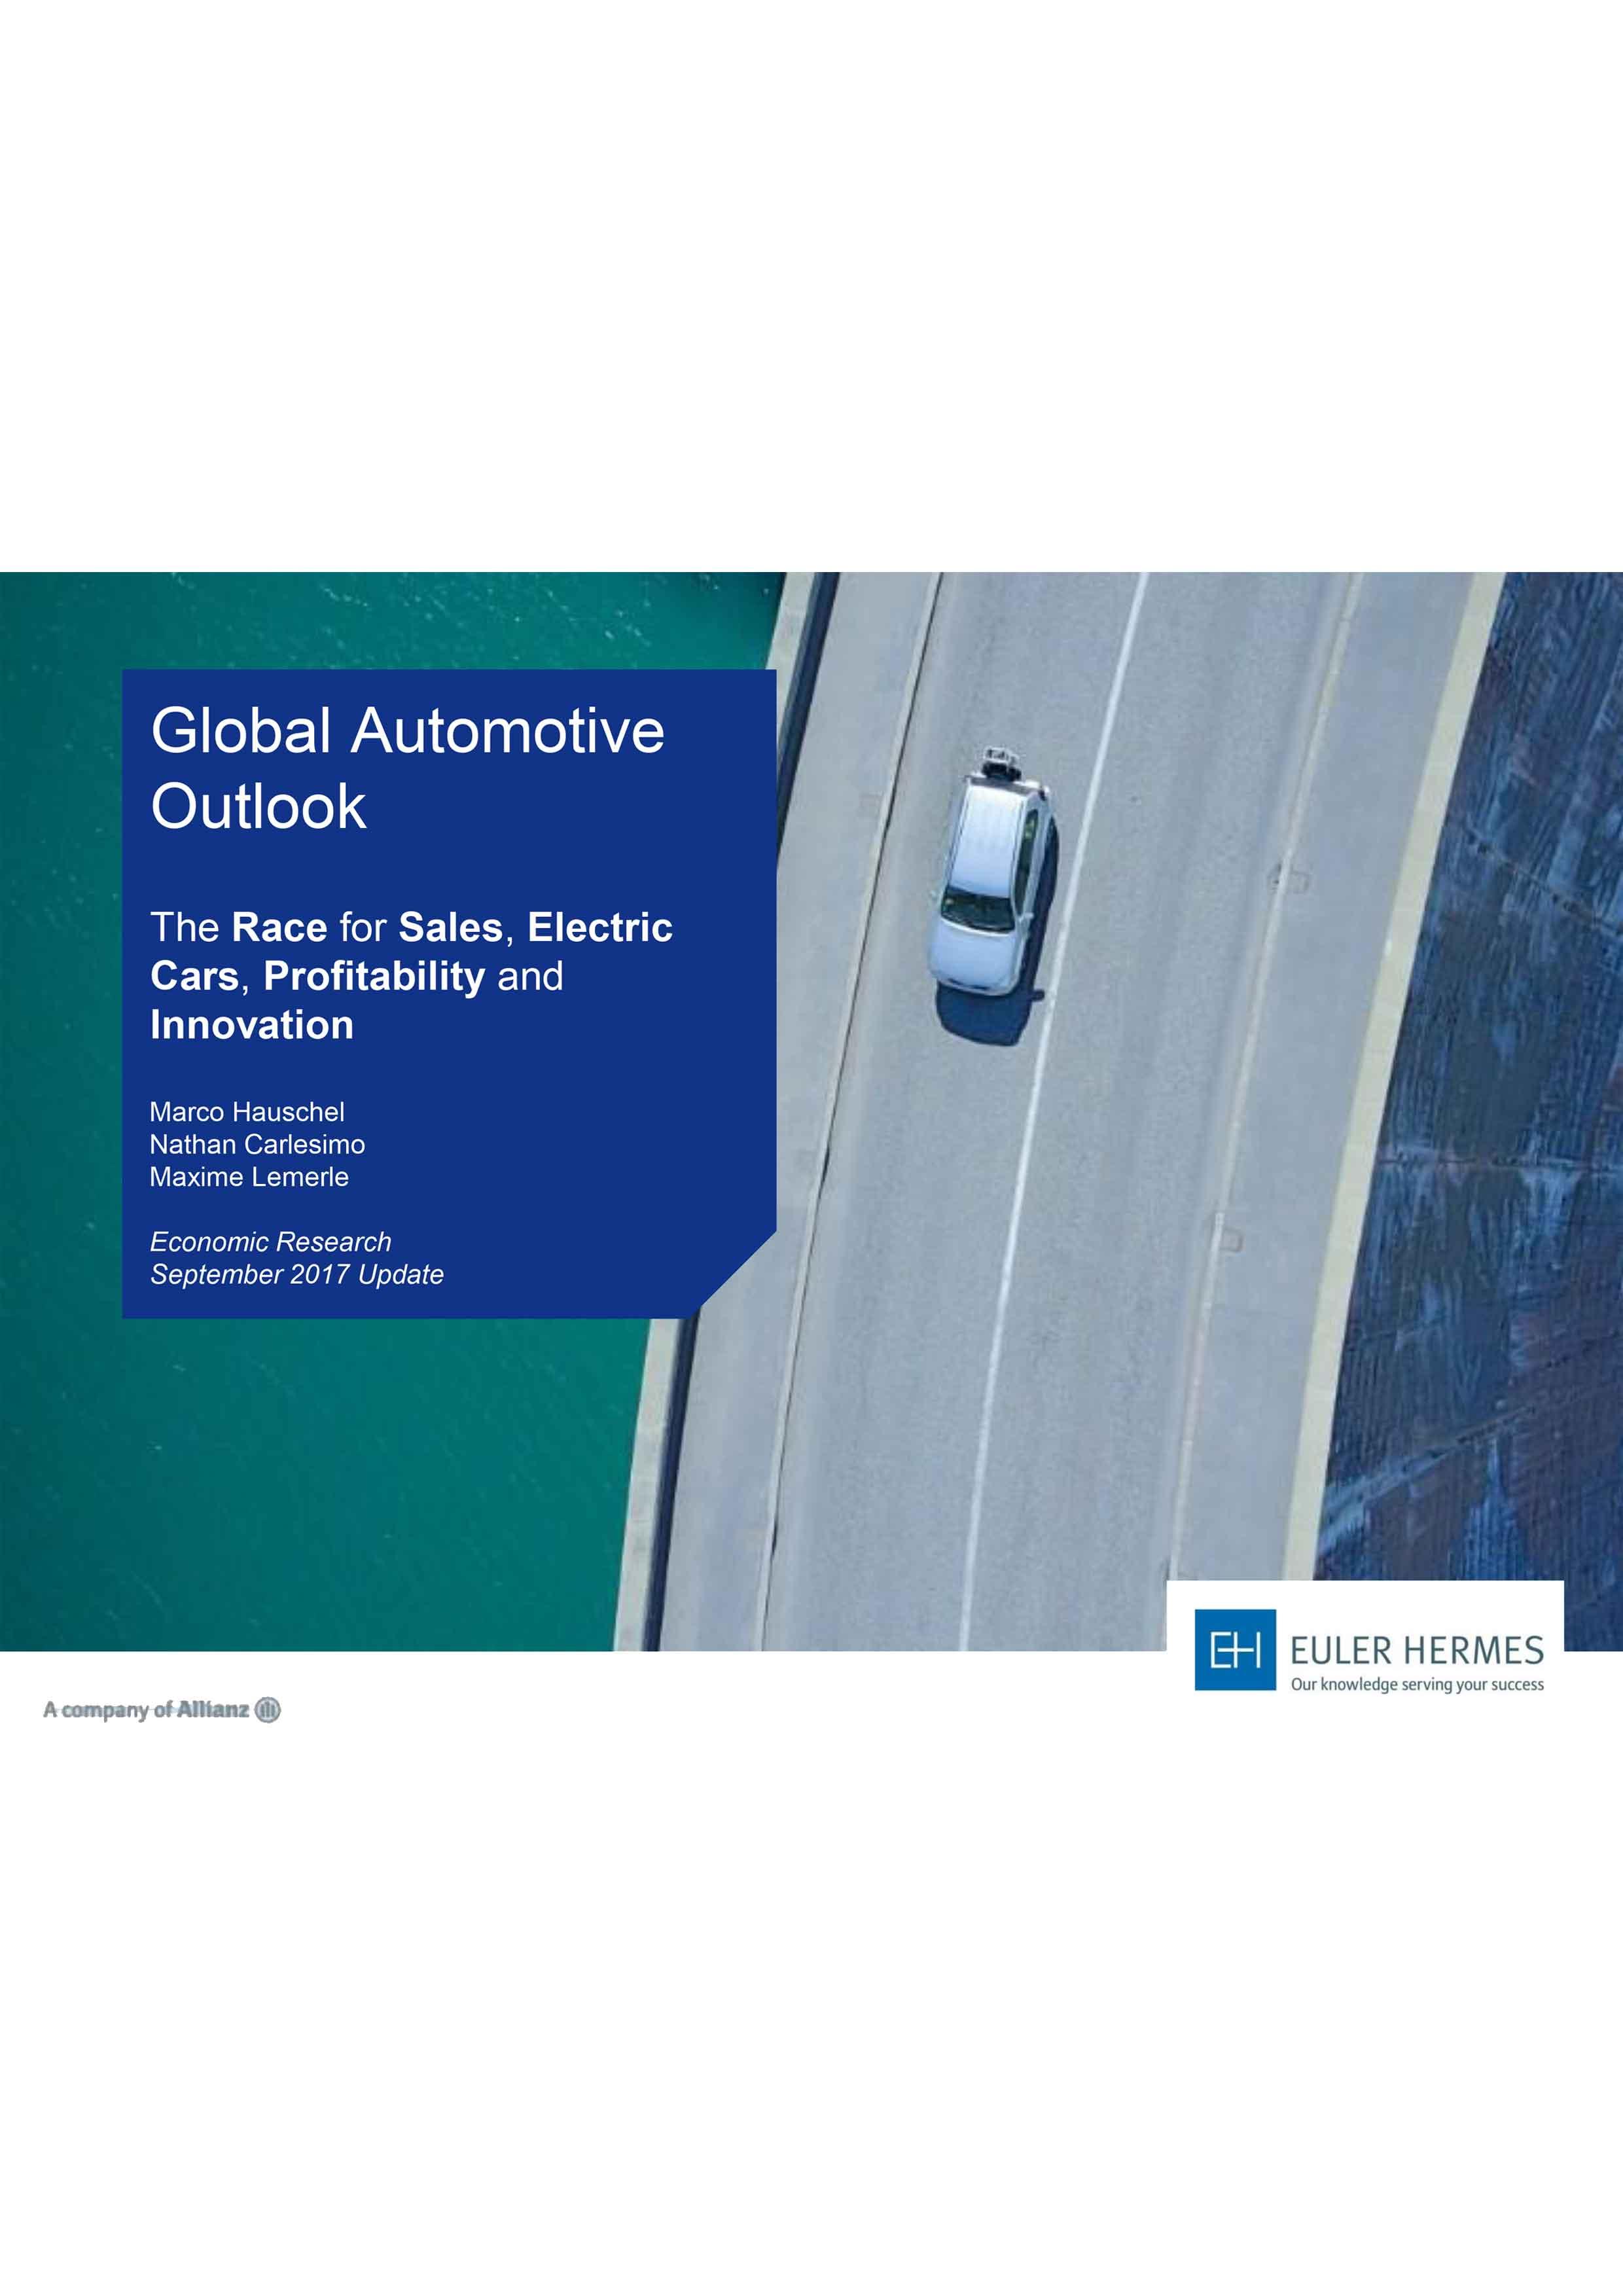 Global Automotive Outlook